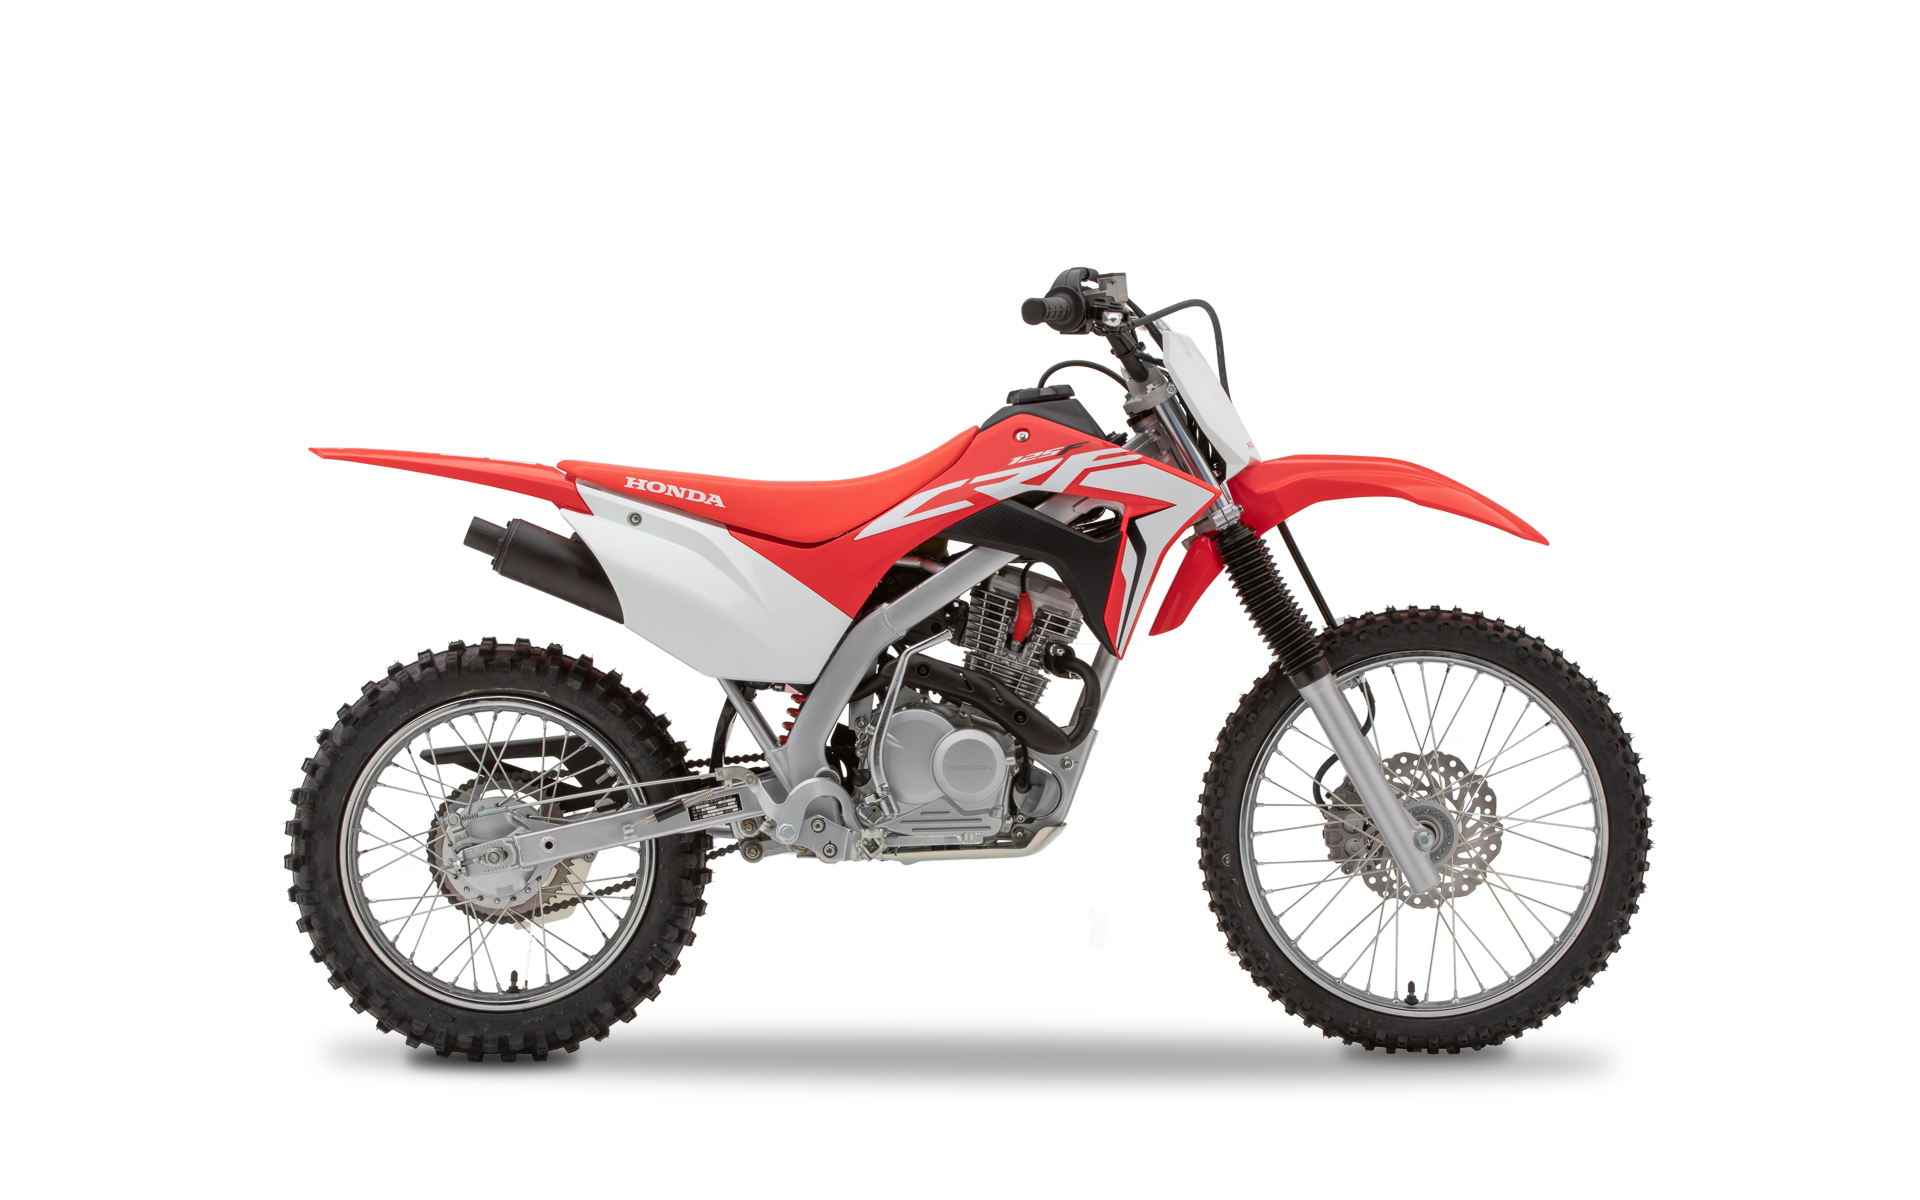 2021 Honda crf125f big wheel